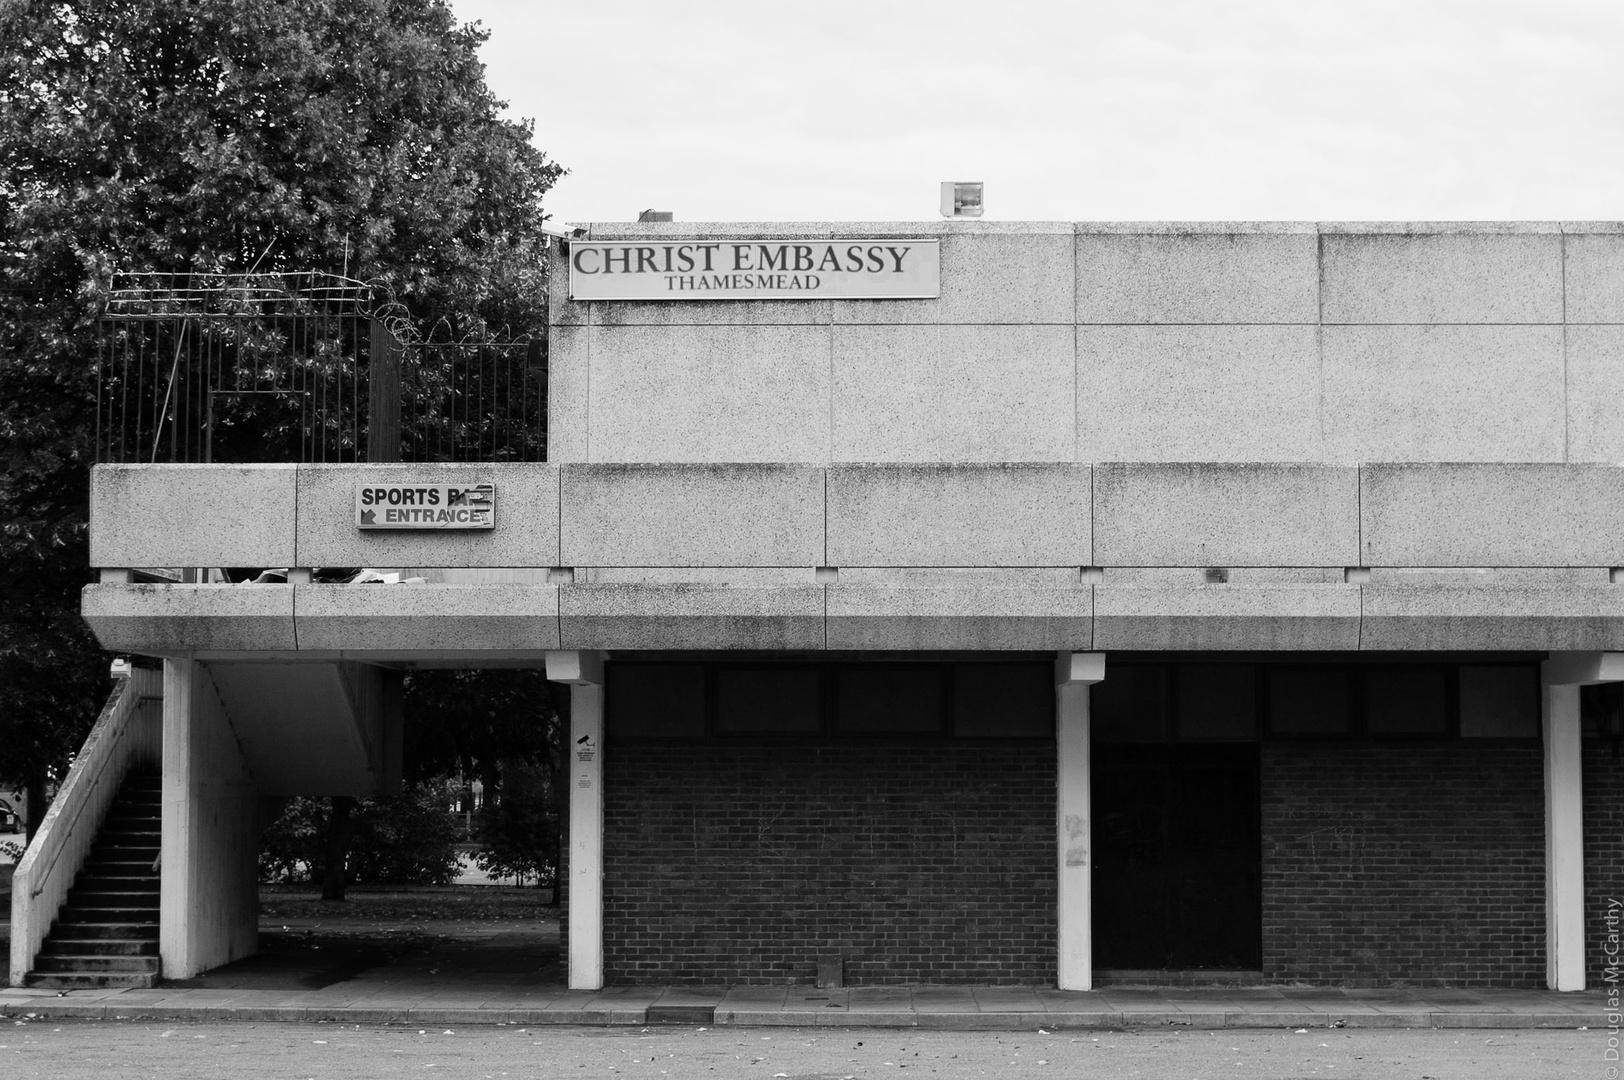 Christ Embassy, 2010